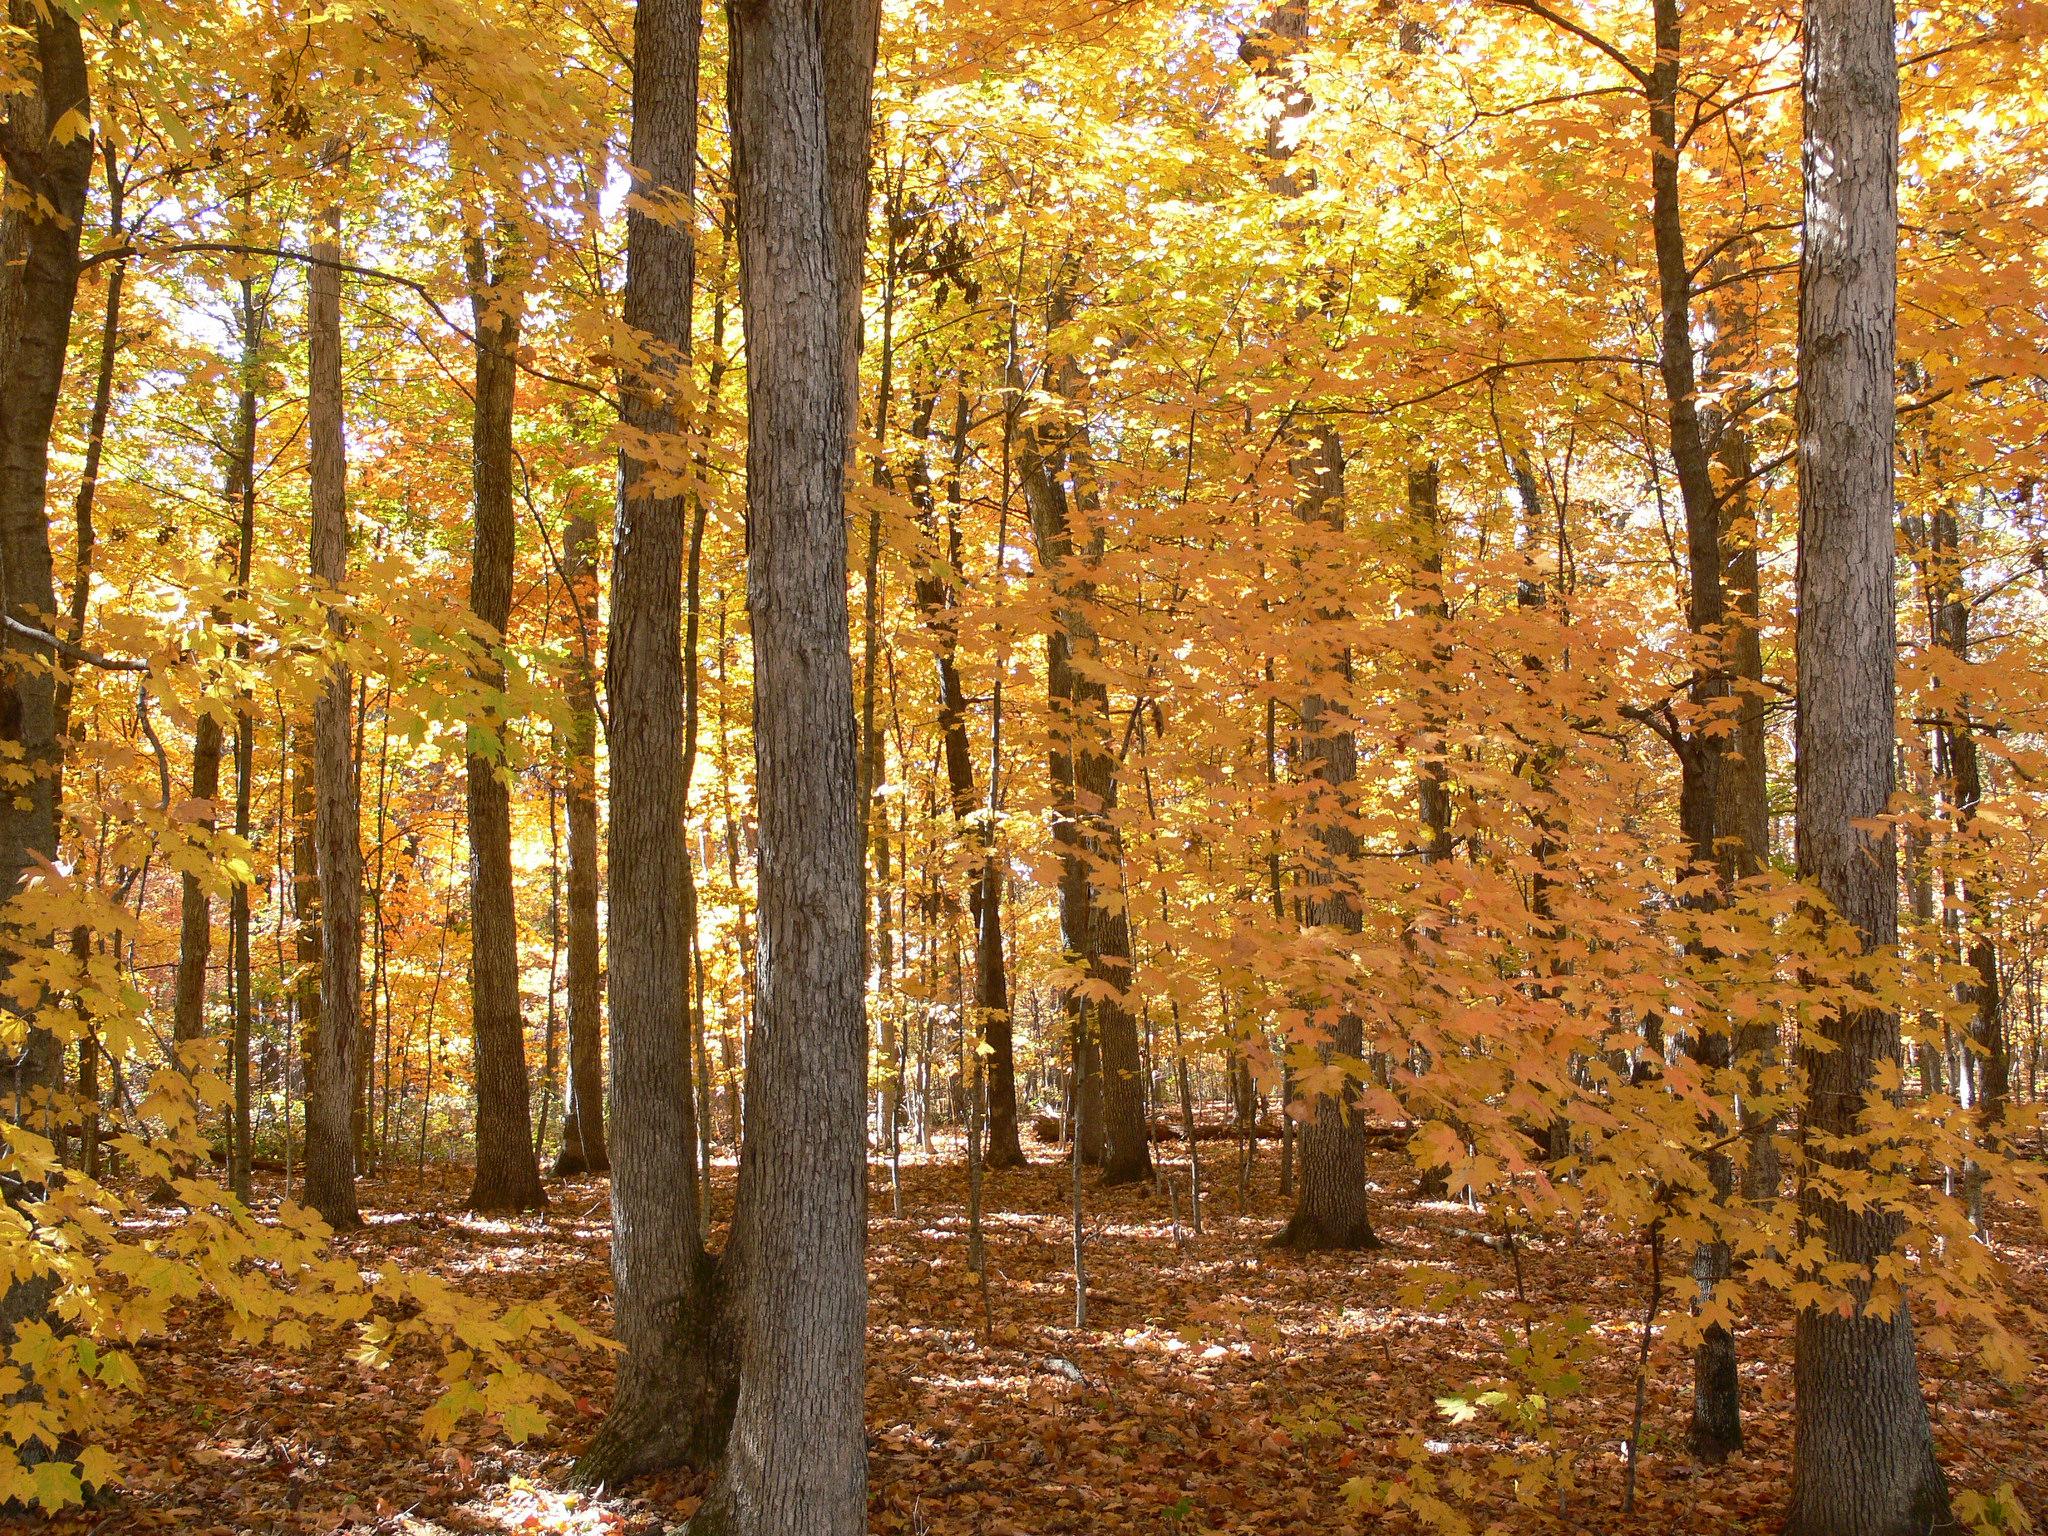 Fall foliage festivalteach to be happy day